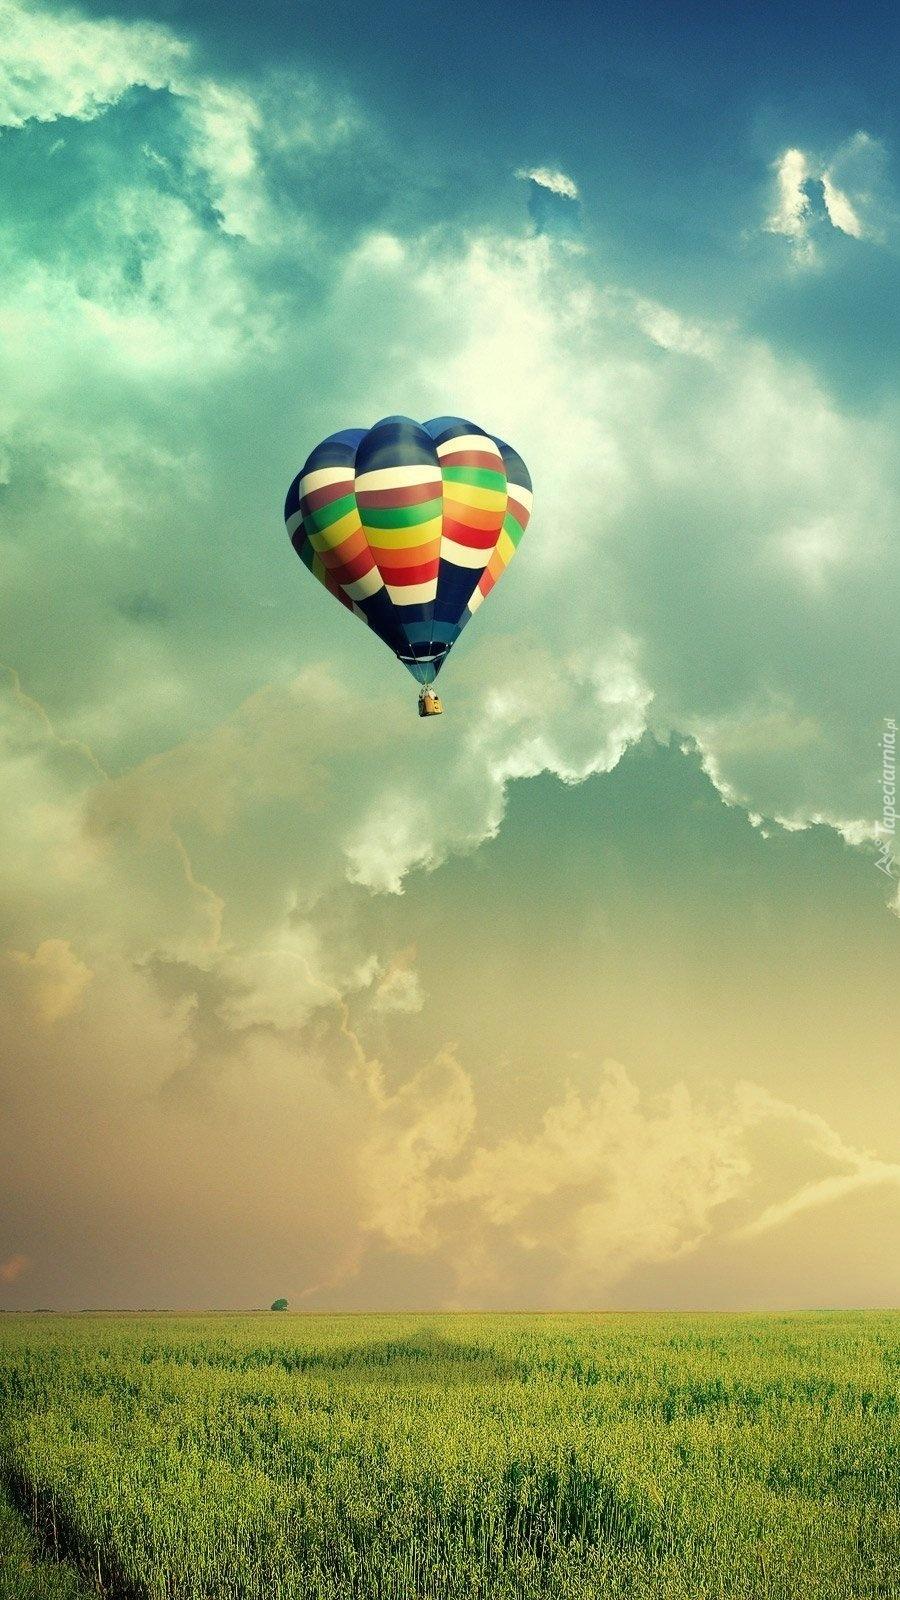 Kolorowy balon w chmurach